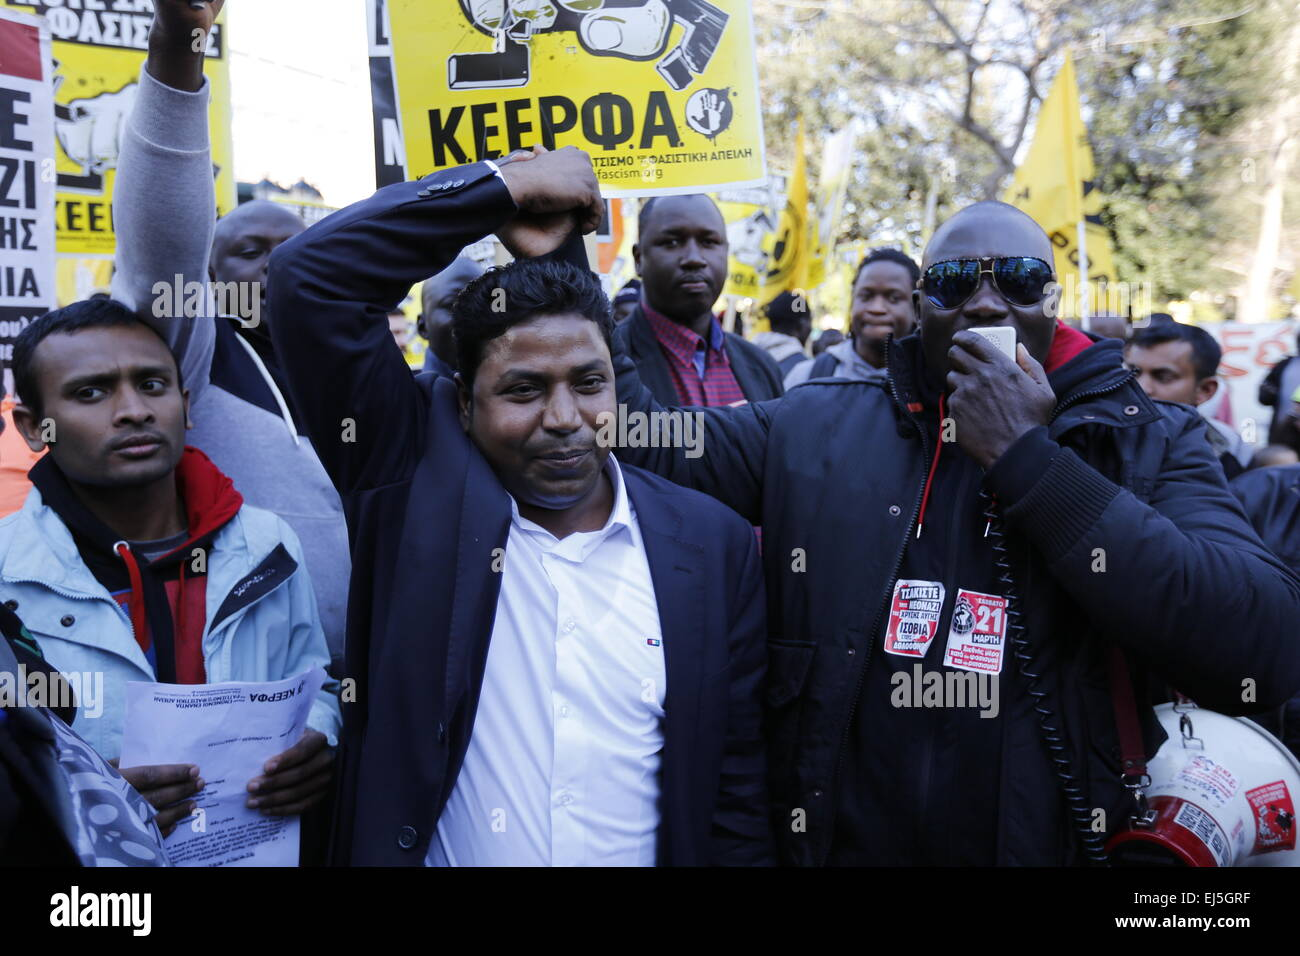 Athens, Greece. 21st March 2015. Immigrants shout slogans against rasicsm. ANTARSYA (Anticapitalist Left Cooperation - Stock Image